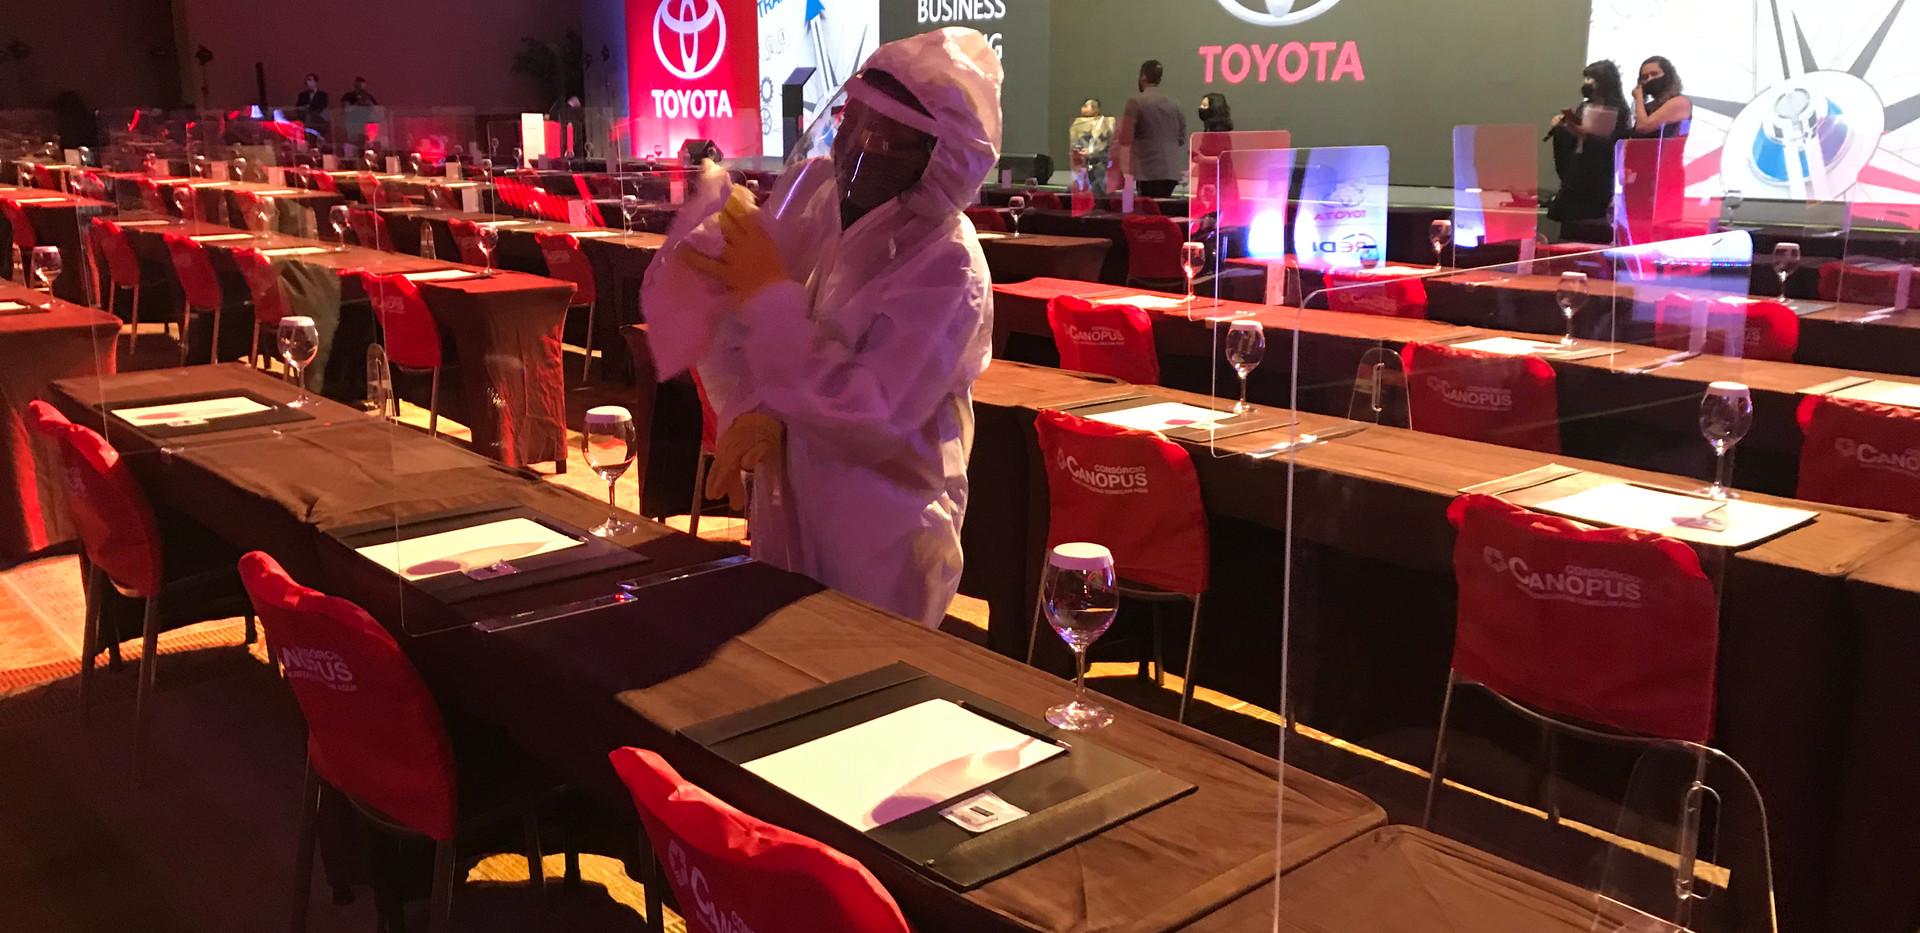 Evento Hibrido Toyota Desinfeccao